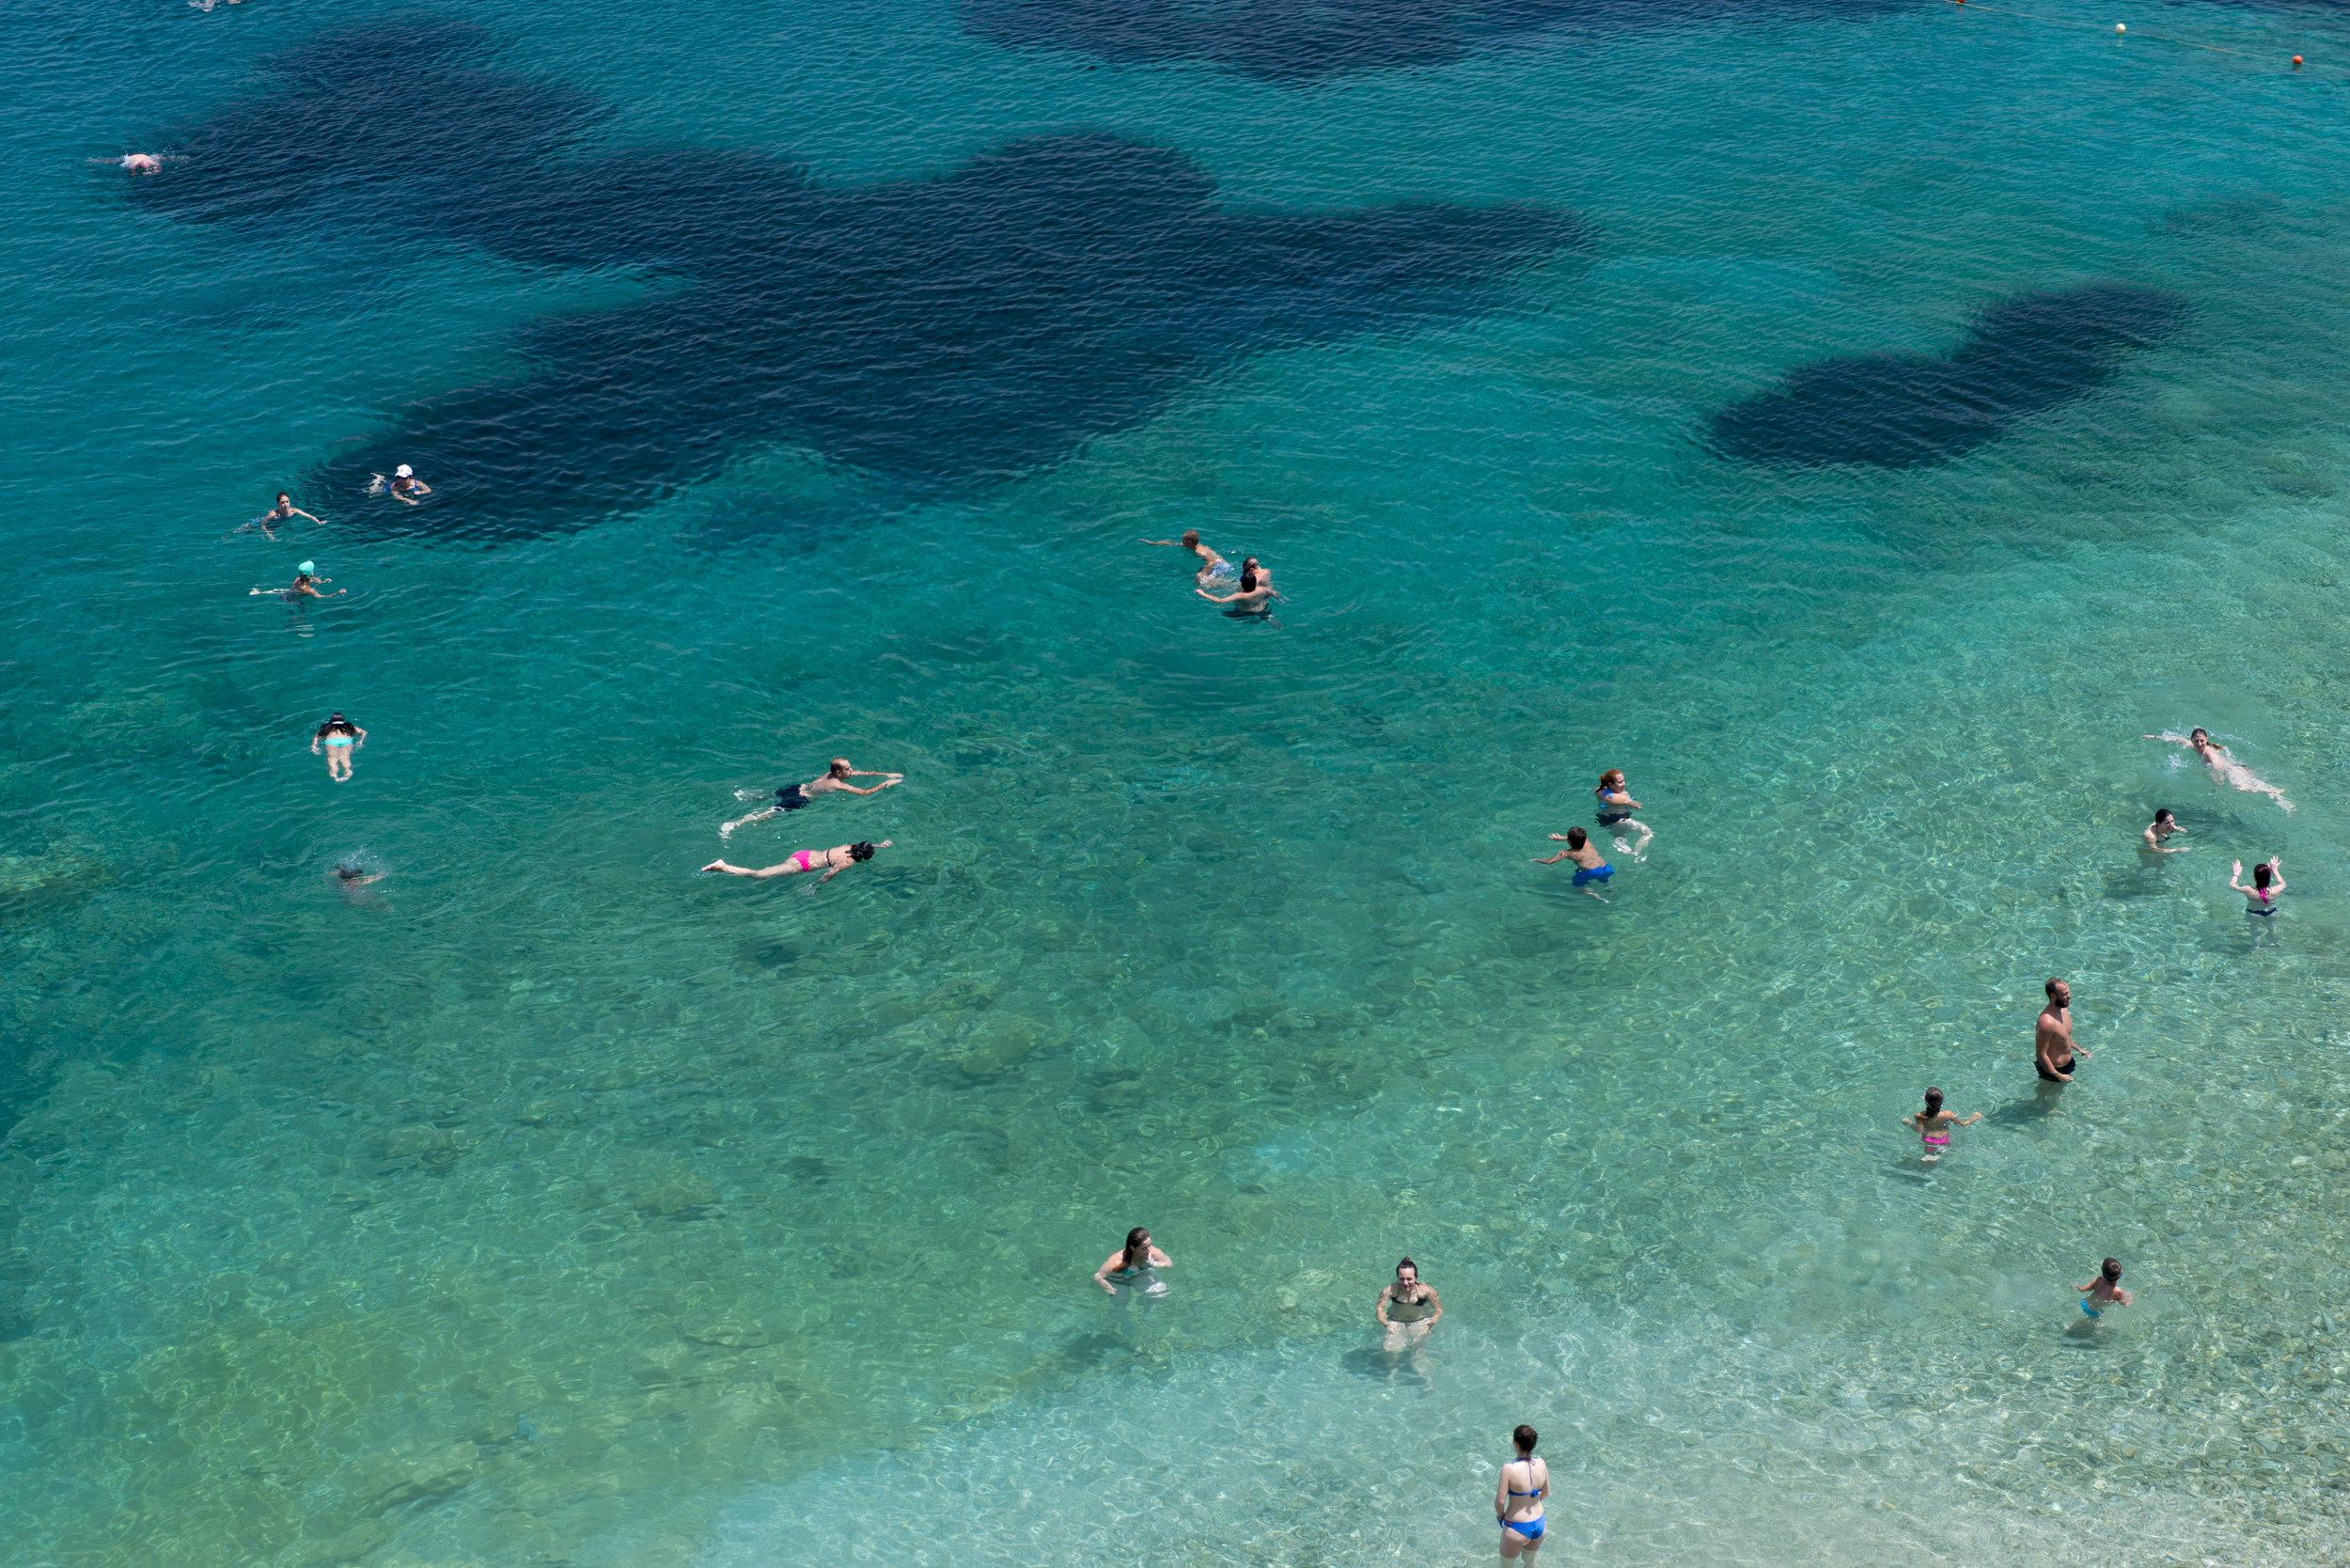 Agia_Pelagia_Agia_Psaromoura_Beach-9_Jo_Hunt_Photography.jpg